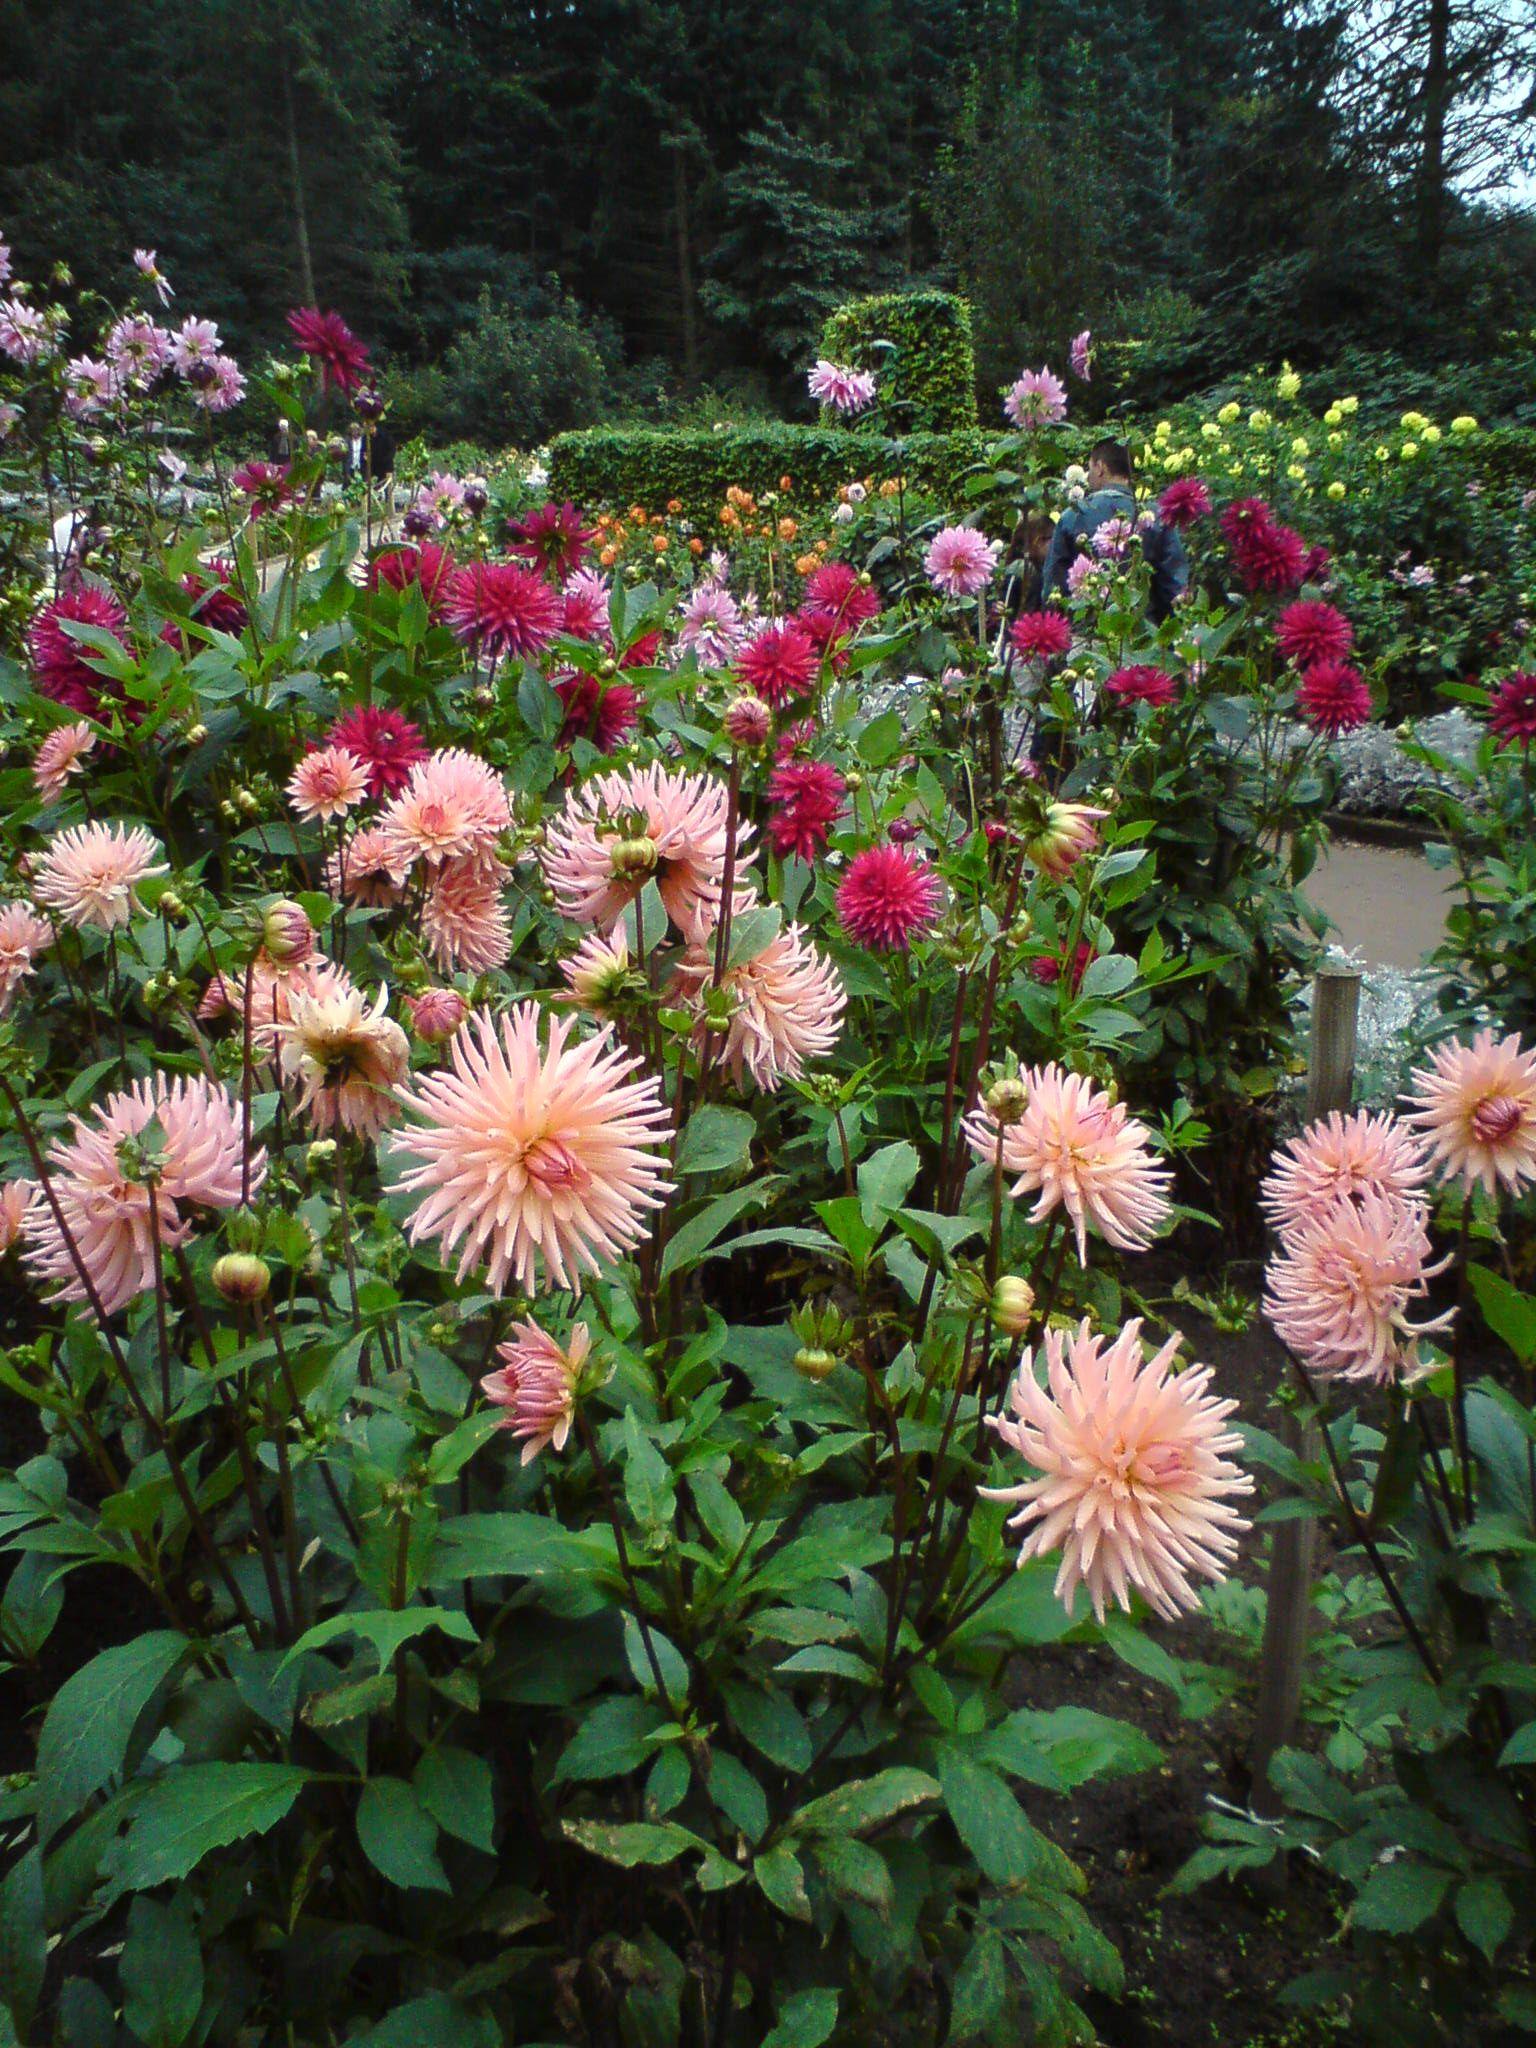 Dahliengarten hamburg dahlias garden flower garden